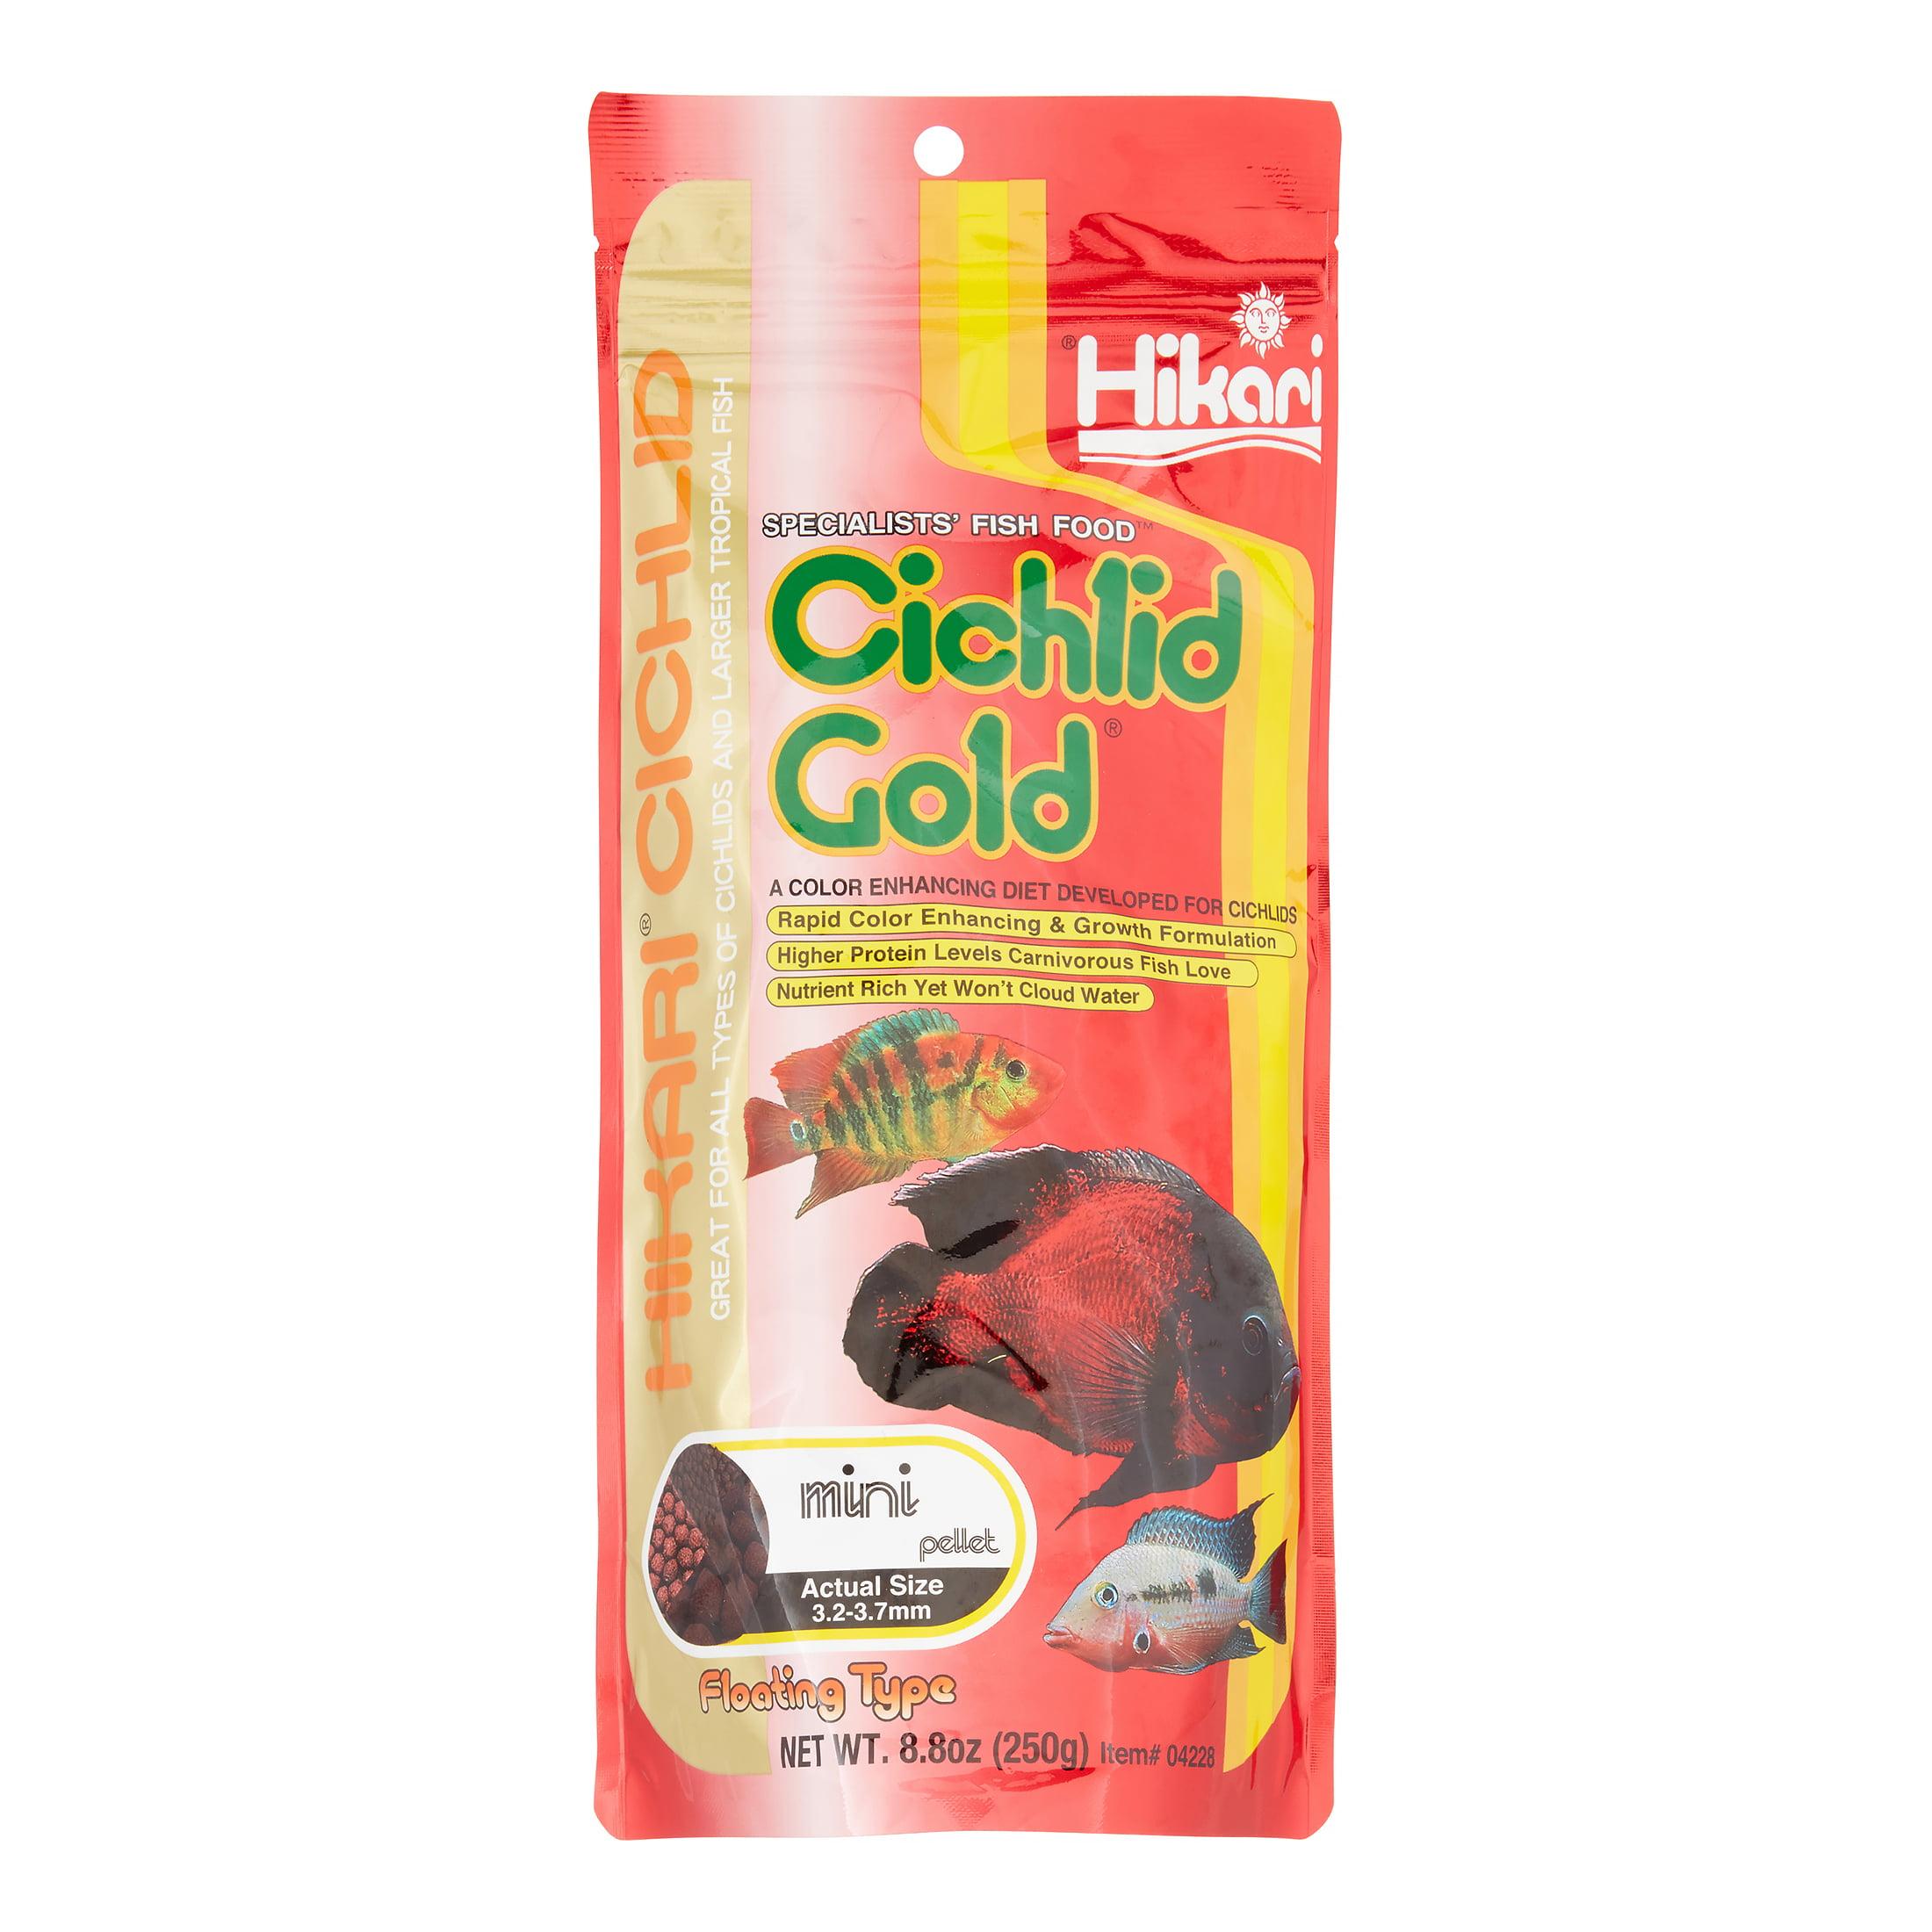 Hikari Cichlid Gold Mini Floating Pellets Freshwater Cichlid Fish Food, 8.8 Oz